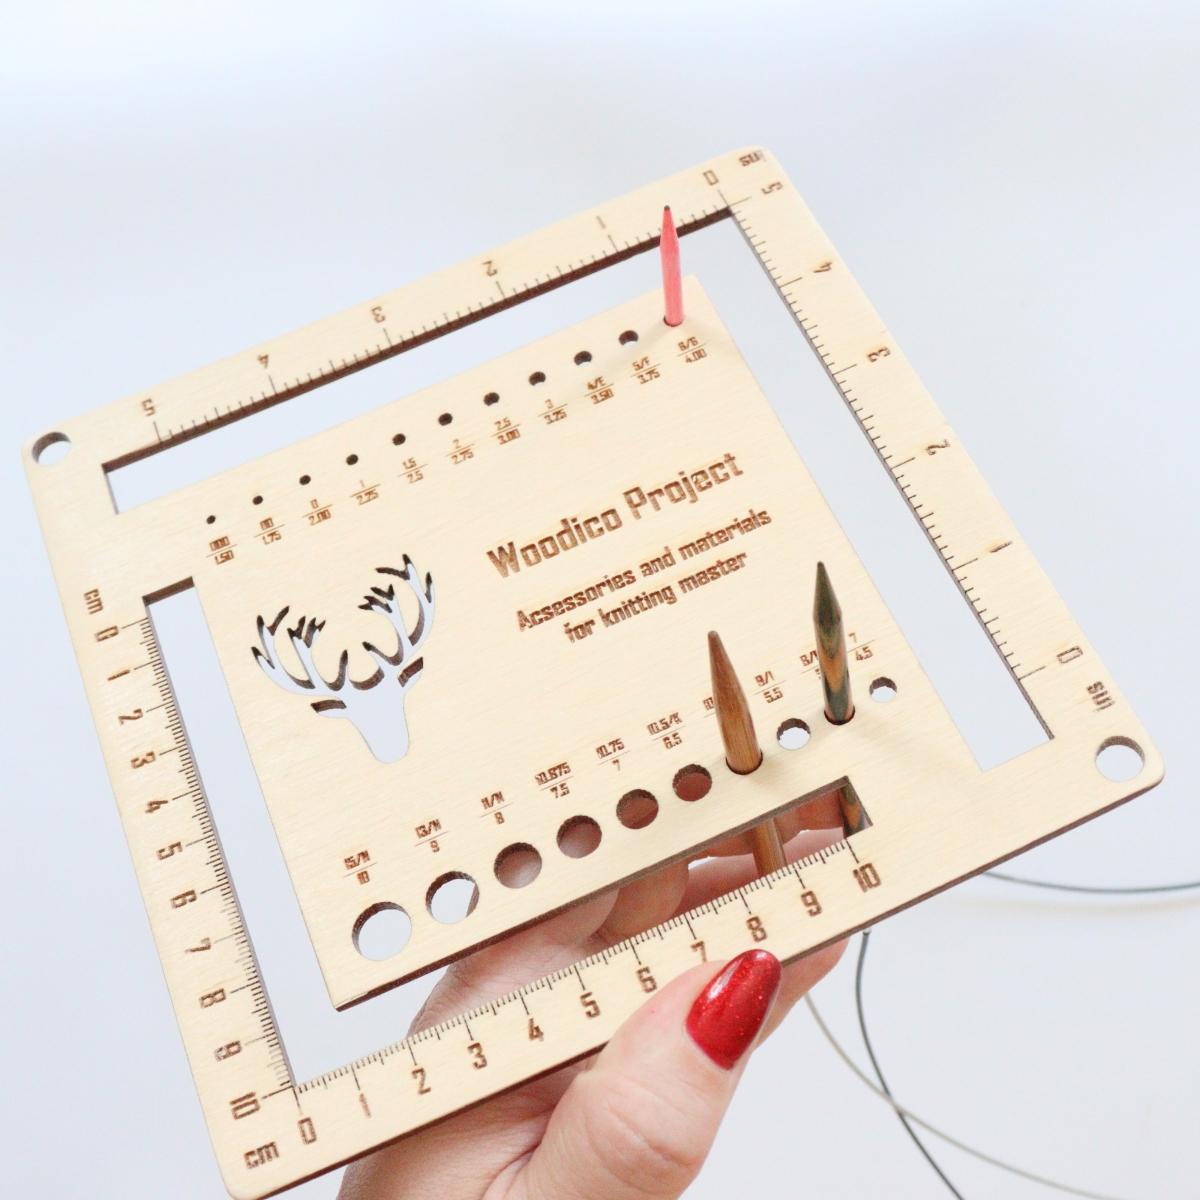 woodico.pro knitmetr 5 1200x1200 - Knitting needle gauge and ruler / Knitmetr